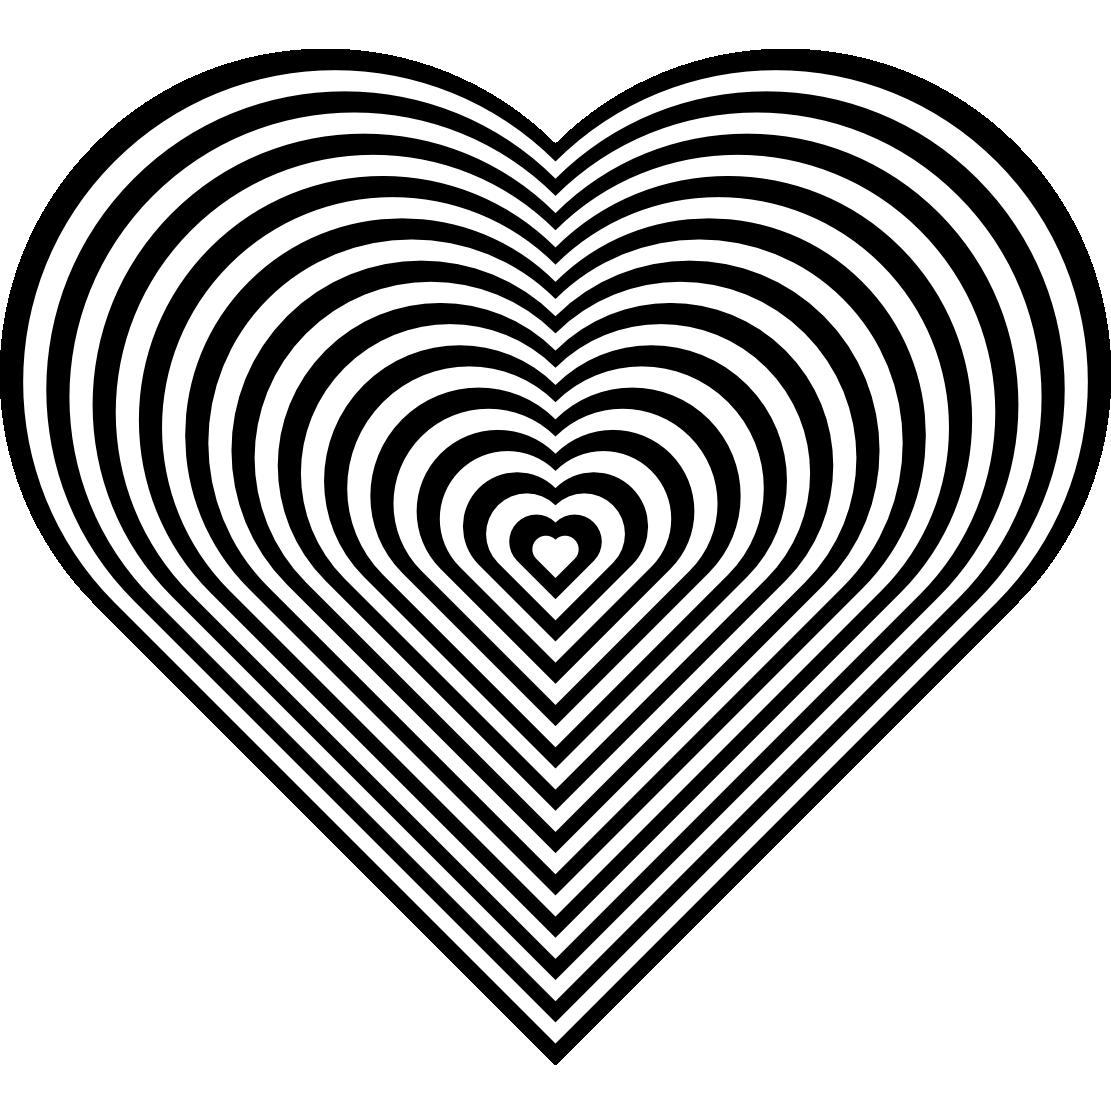 Coloriage Mandalas Coeur #116710 (Mandalas) - Album de ...